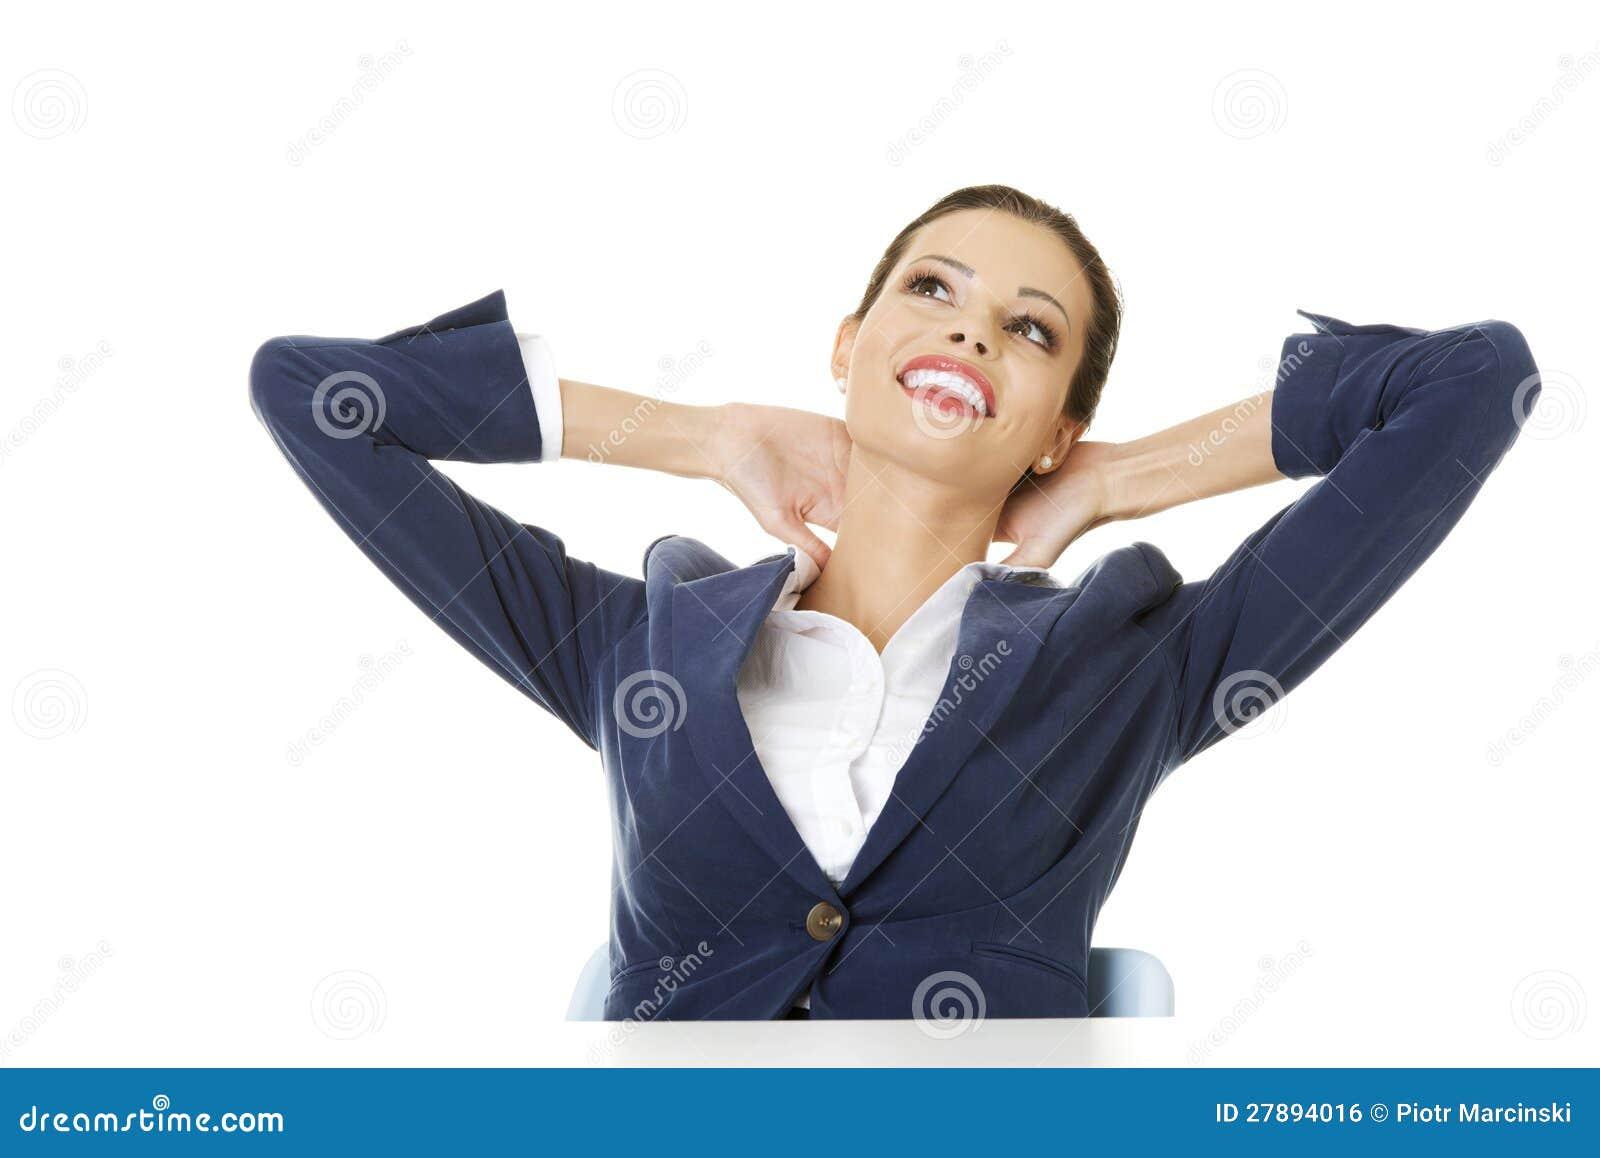 Nipple to clit jewelry